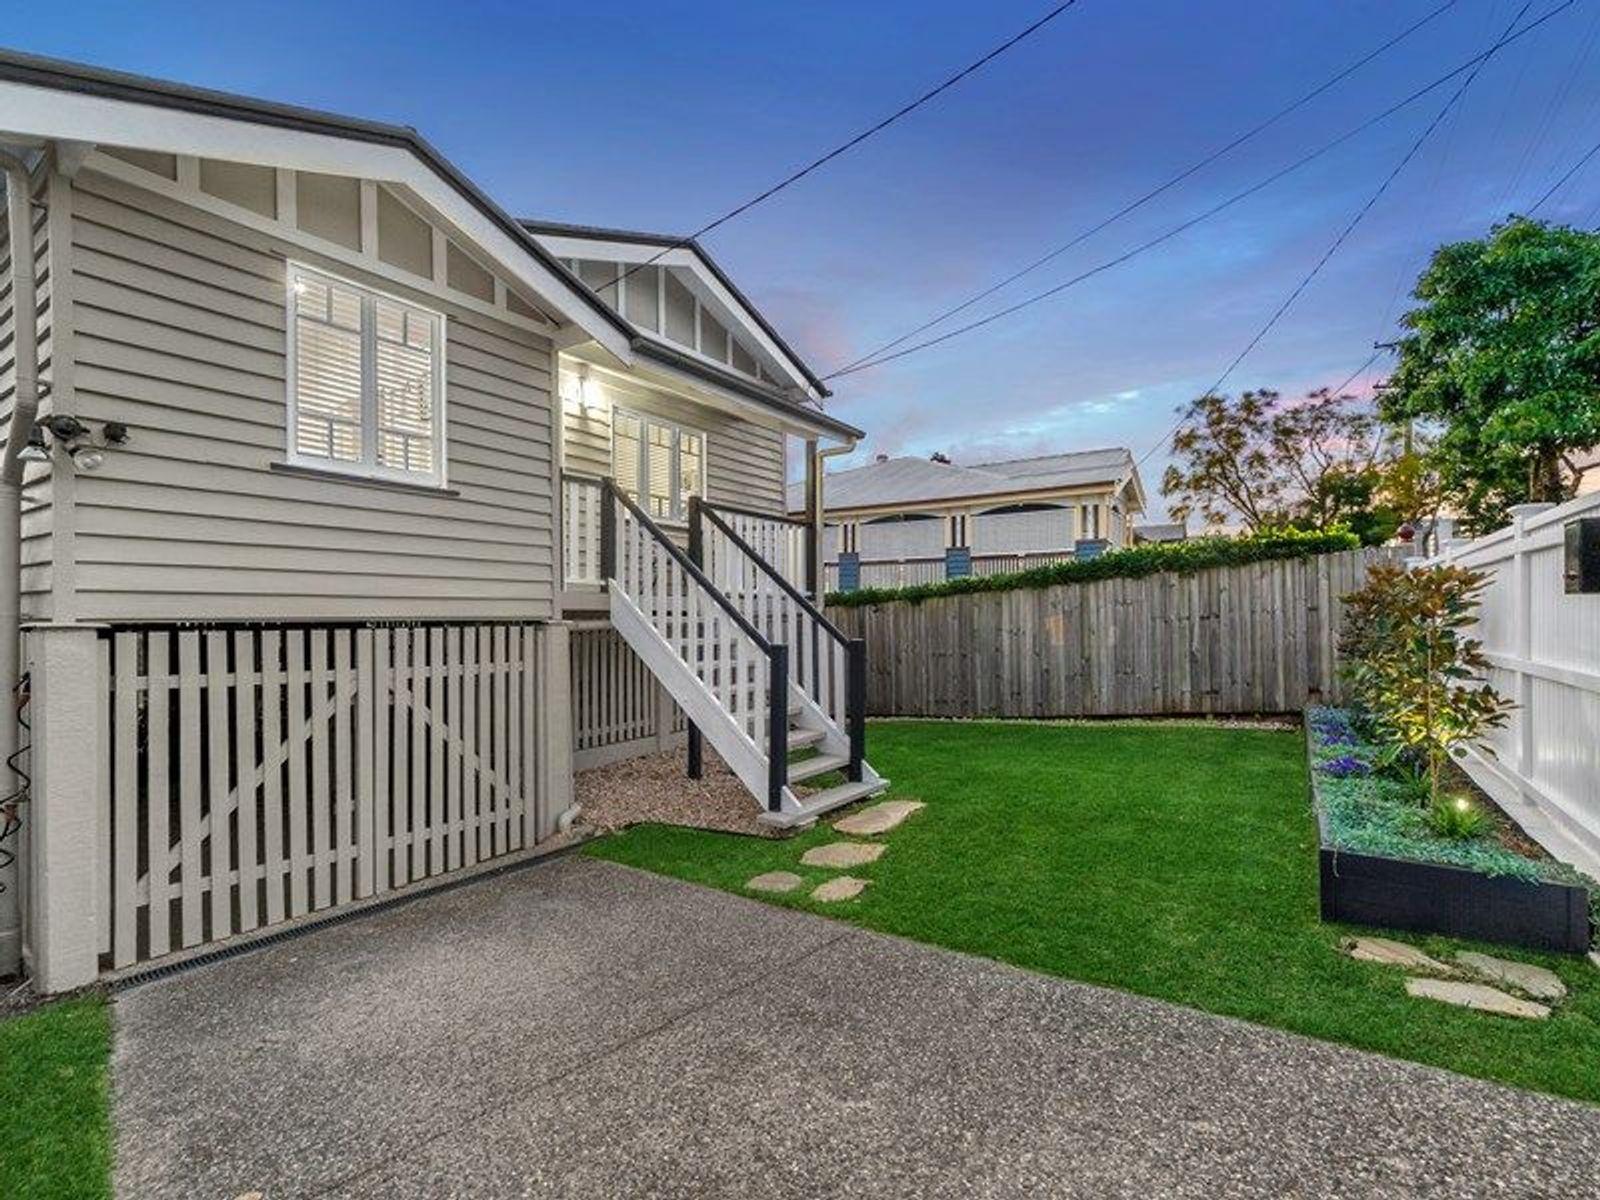 59 Mansfield Street, Coorparoo, QLD 4151